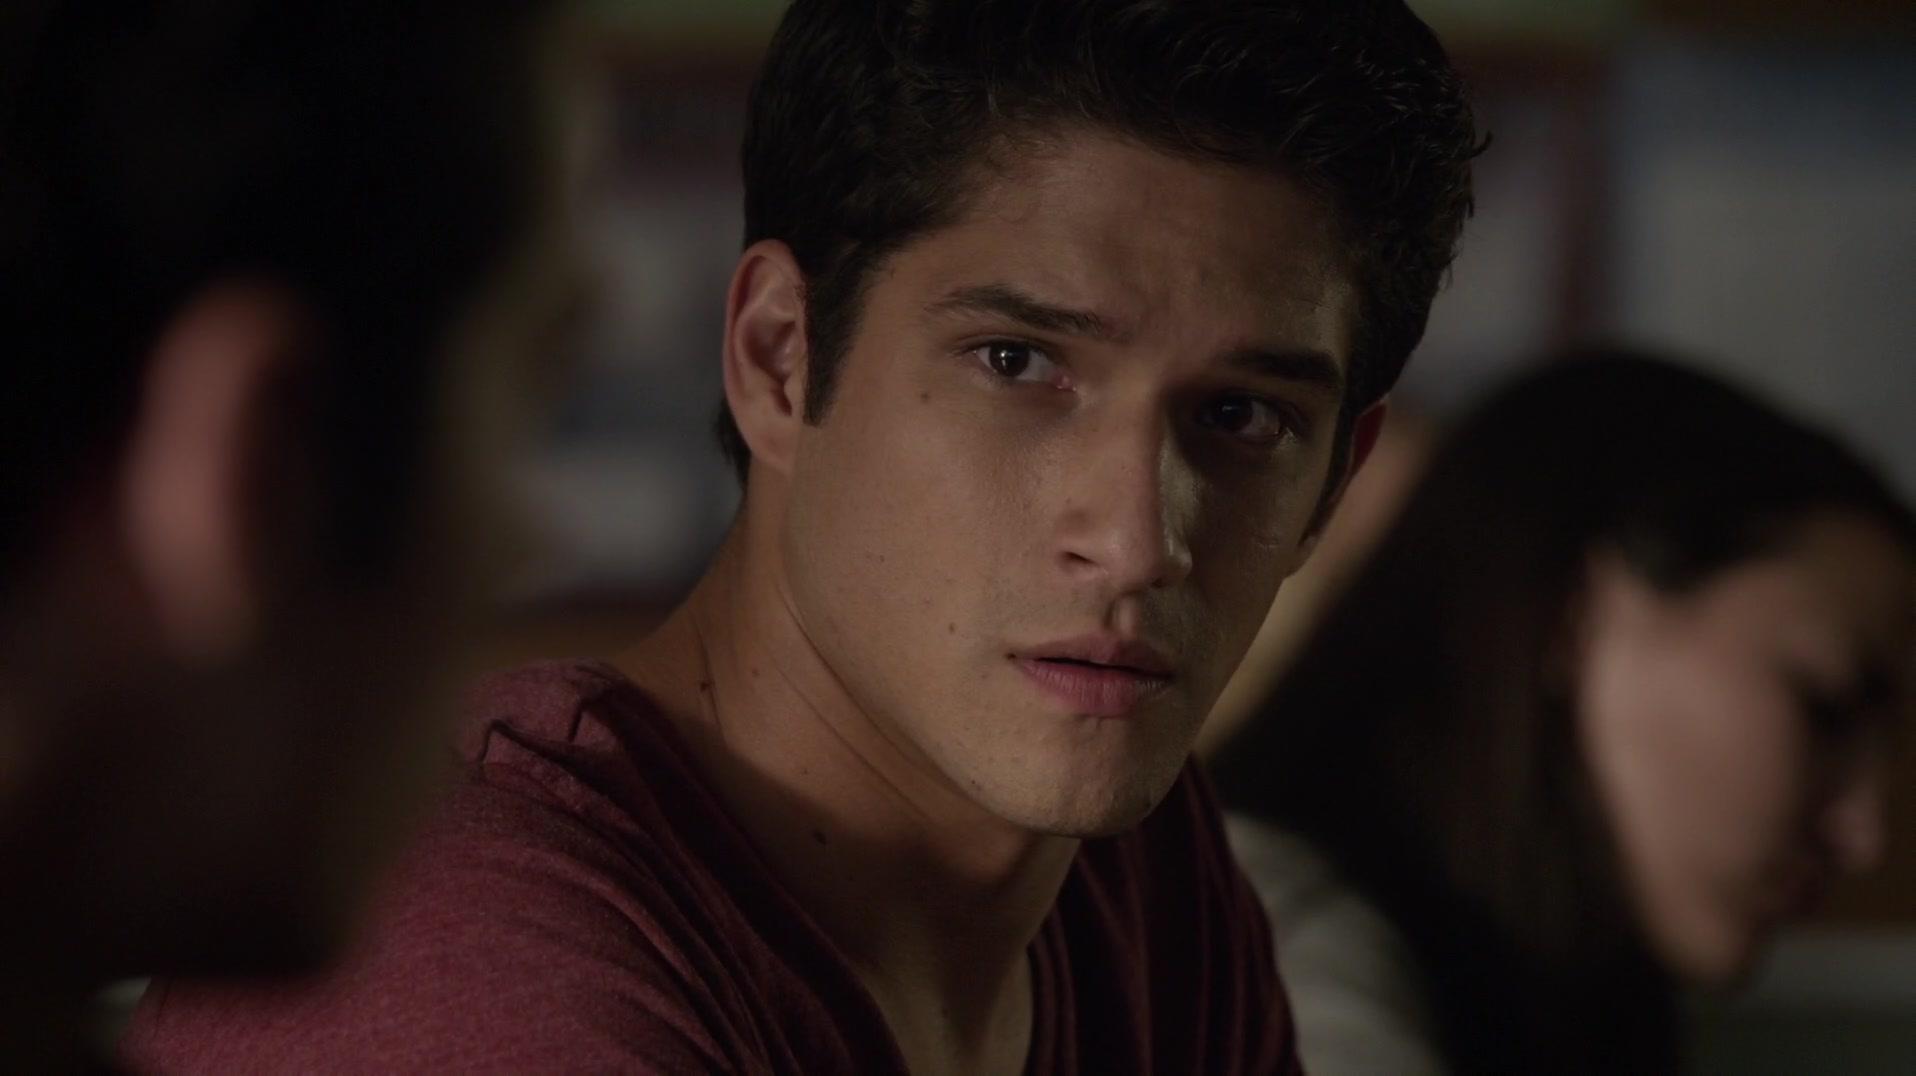 Teenage bedroom tumblr quotes - Teen Wolf Season 3 Episode 13 Quot Anchors Quot Recap Review